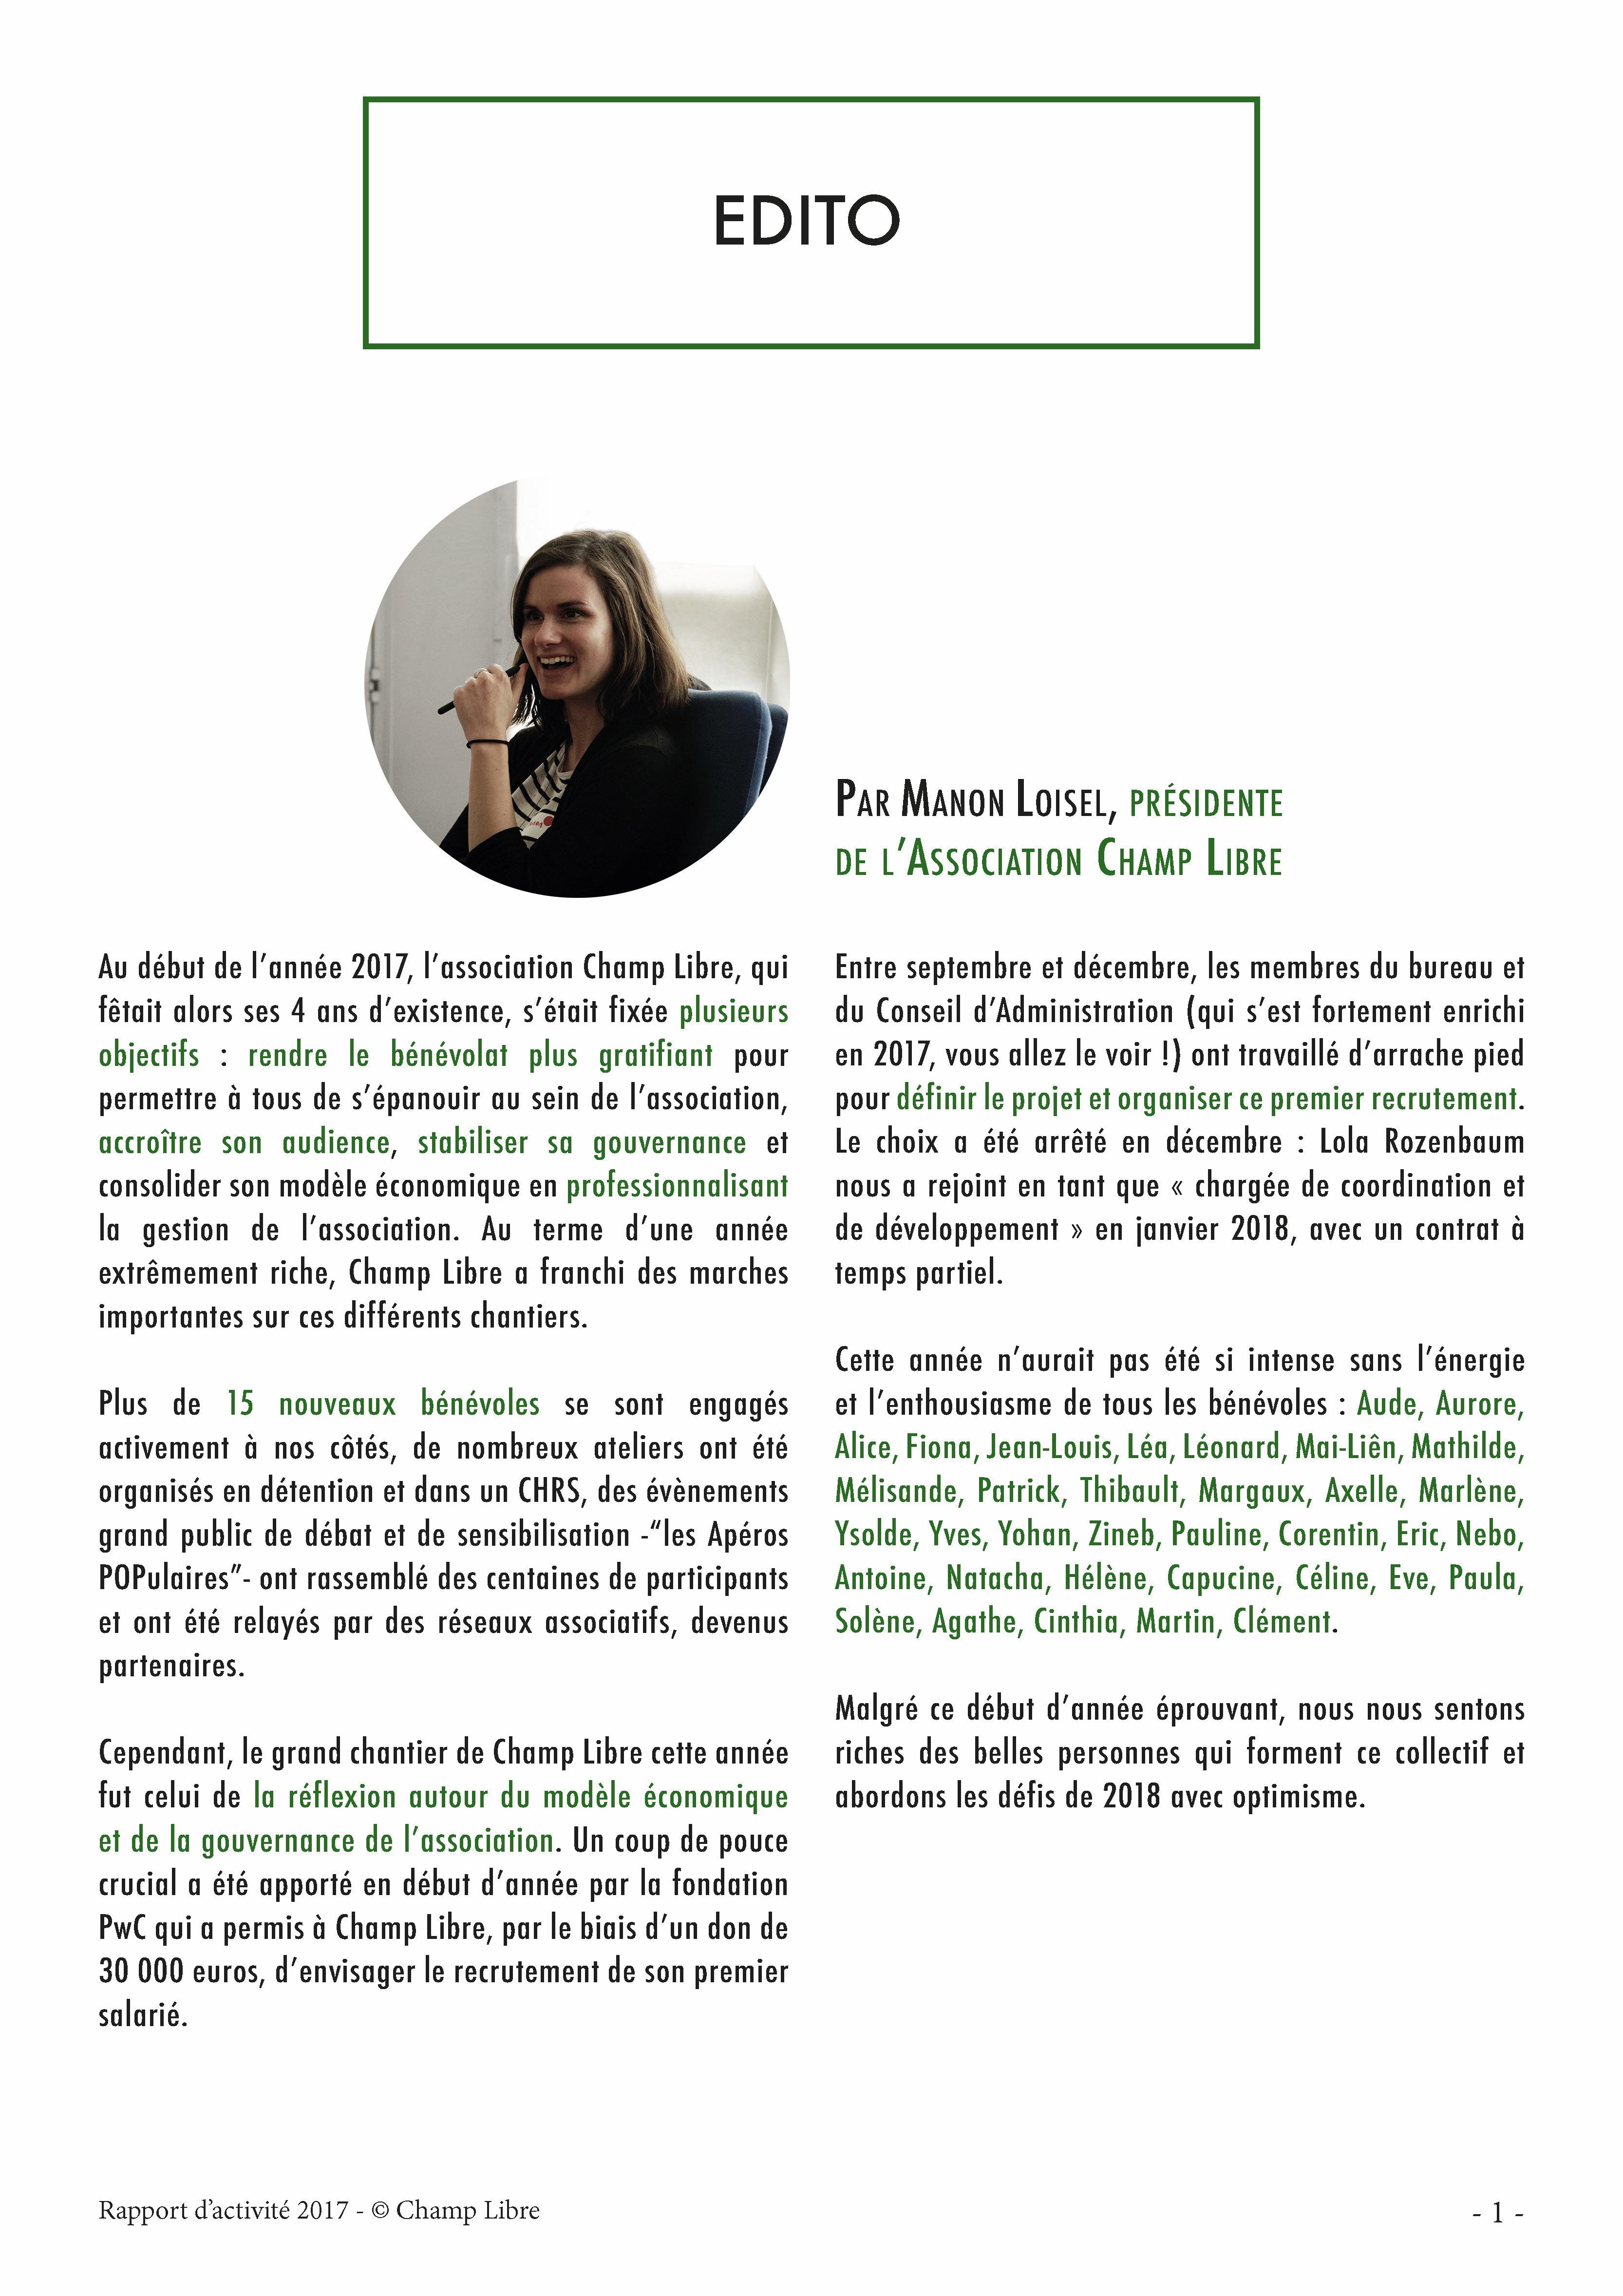 Edito, Manon Loisel, présidente